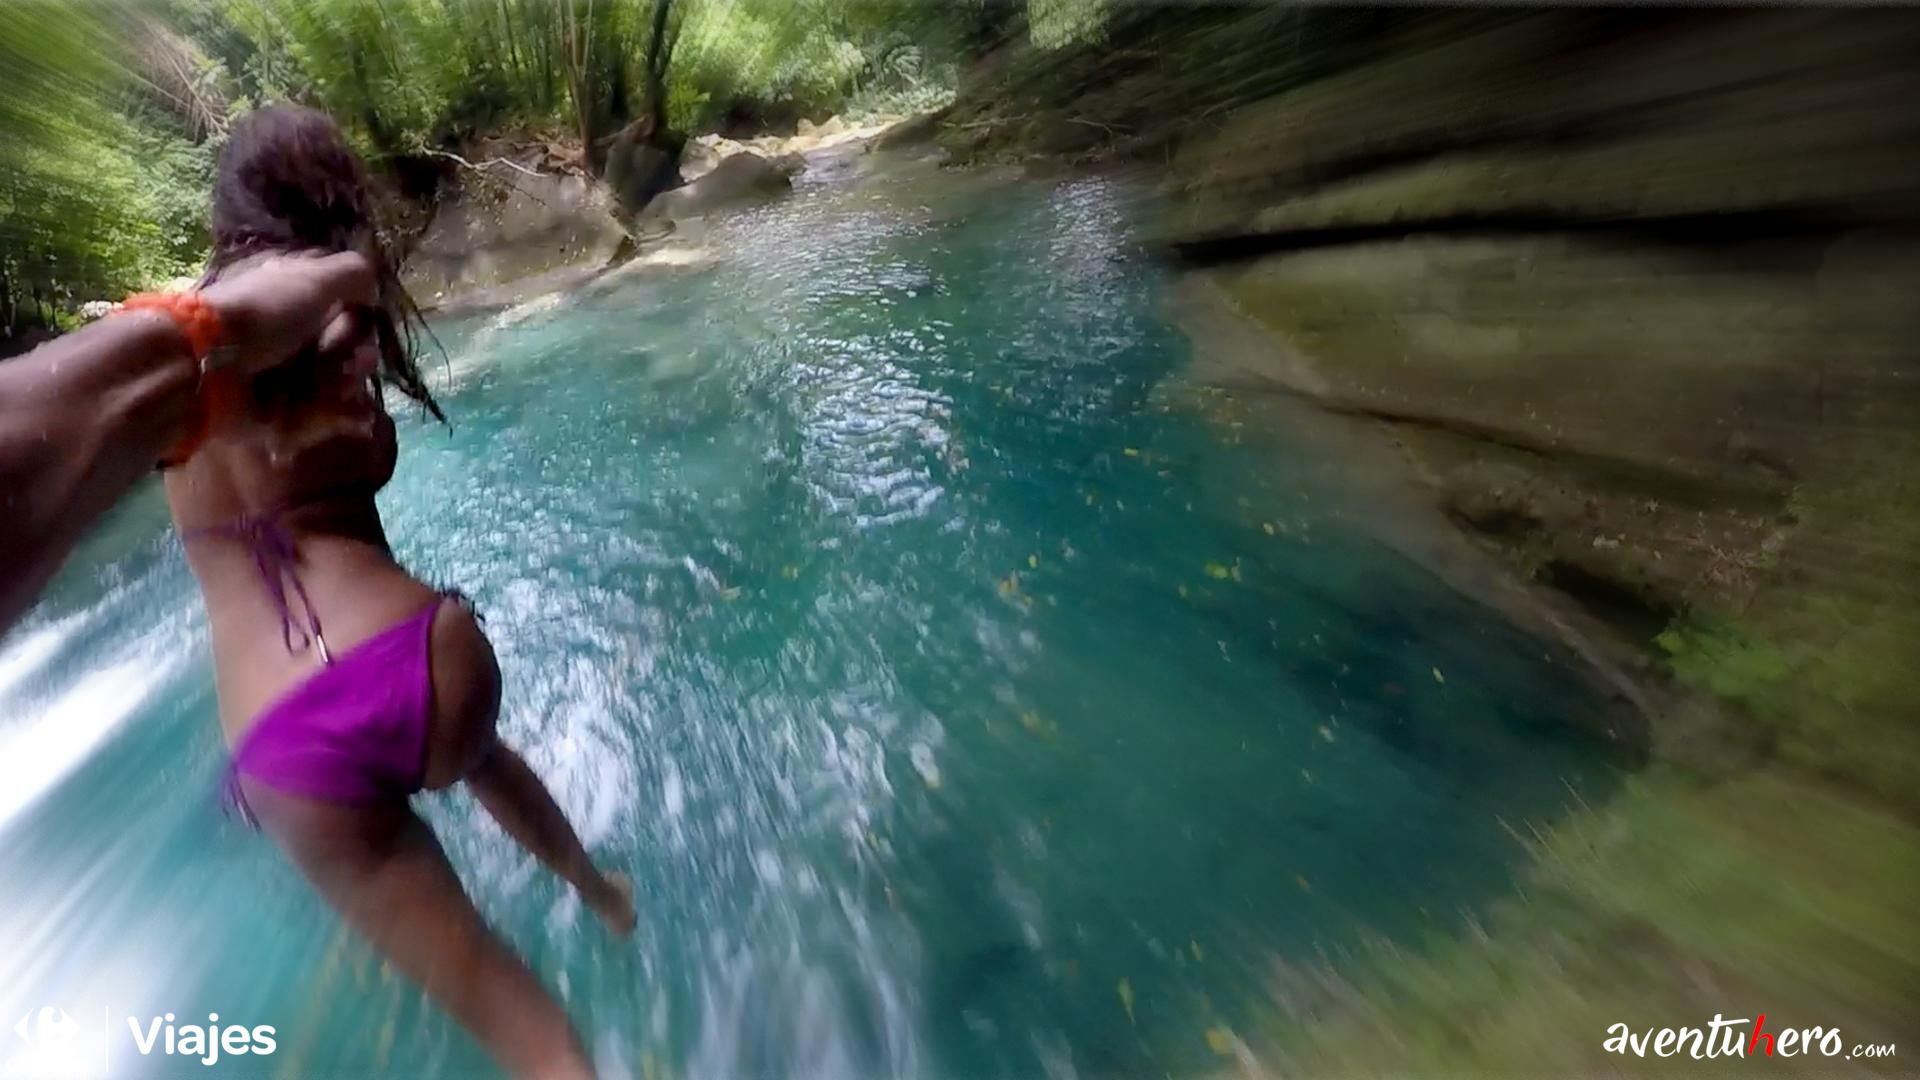 Aventuhero - Allí vamos Natalia! Blue Hole. Jamaica